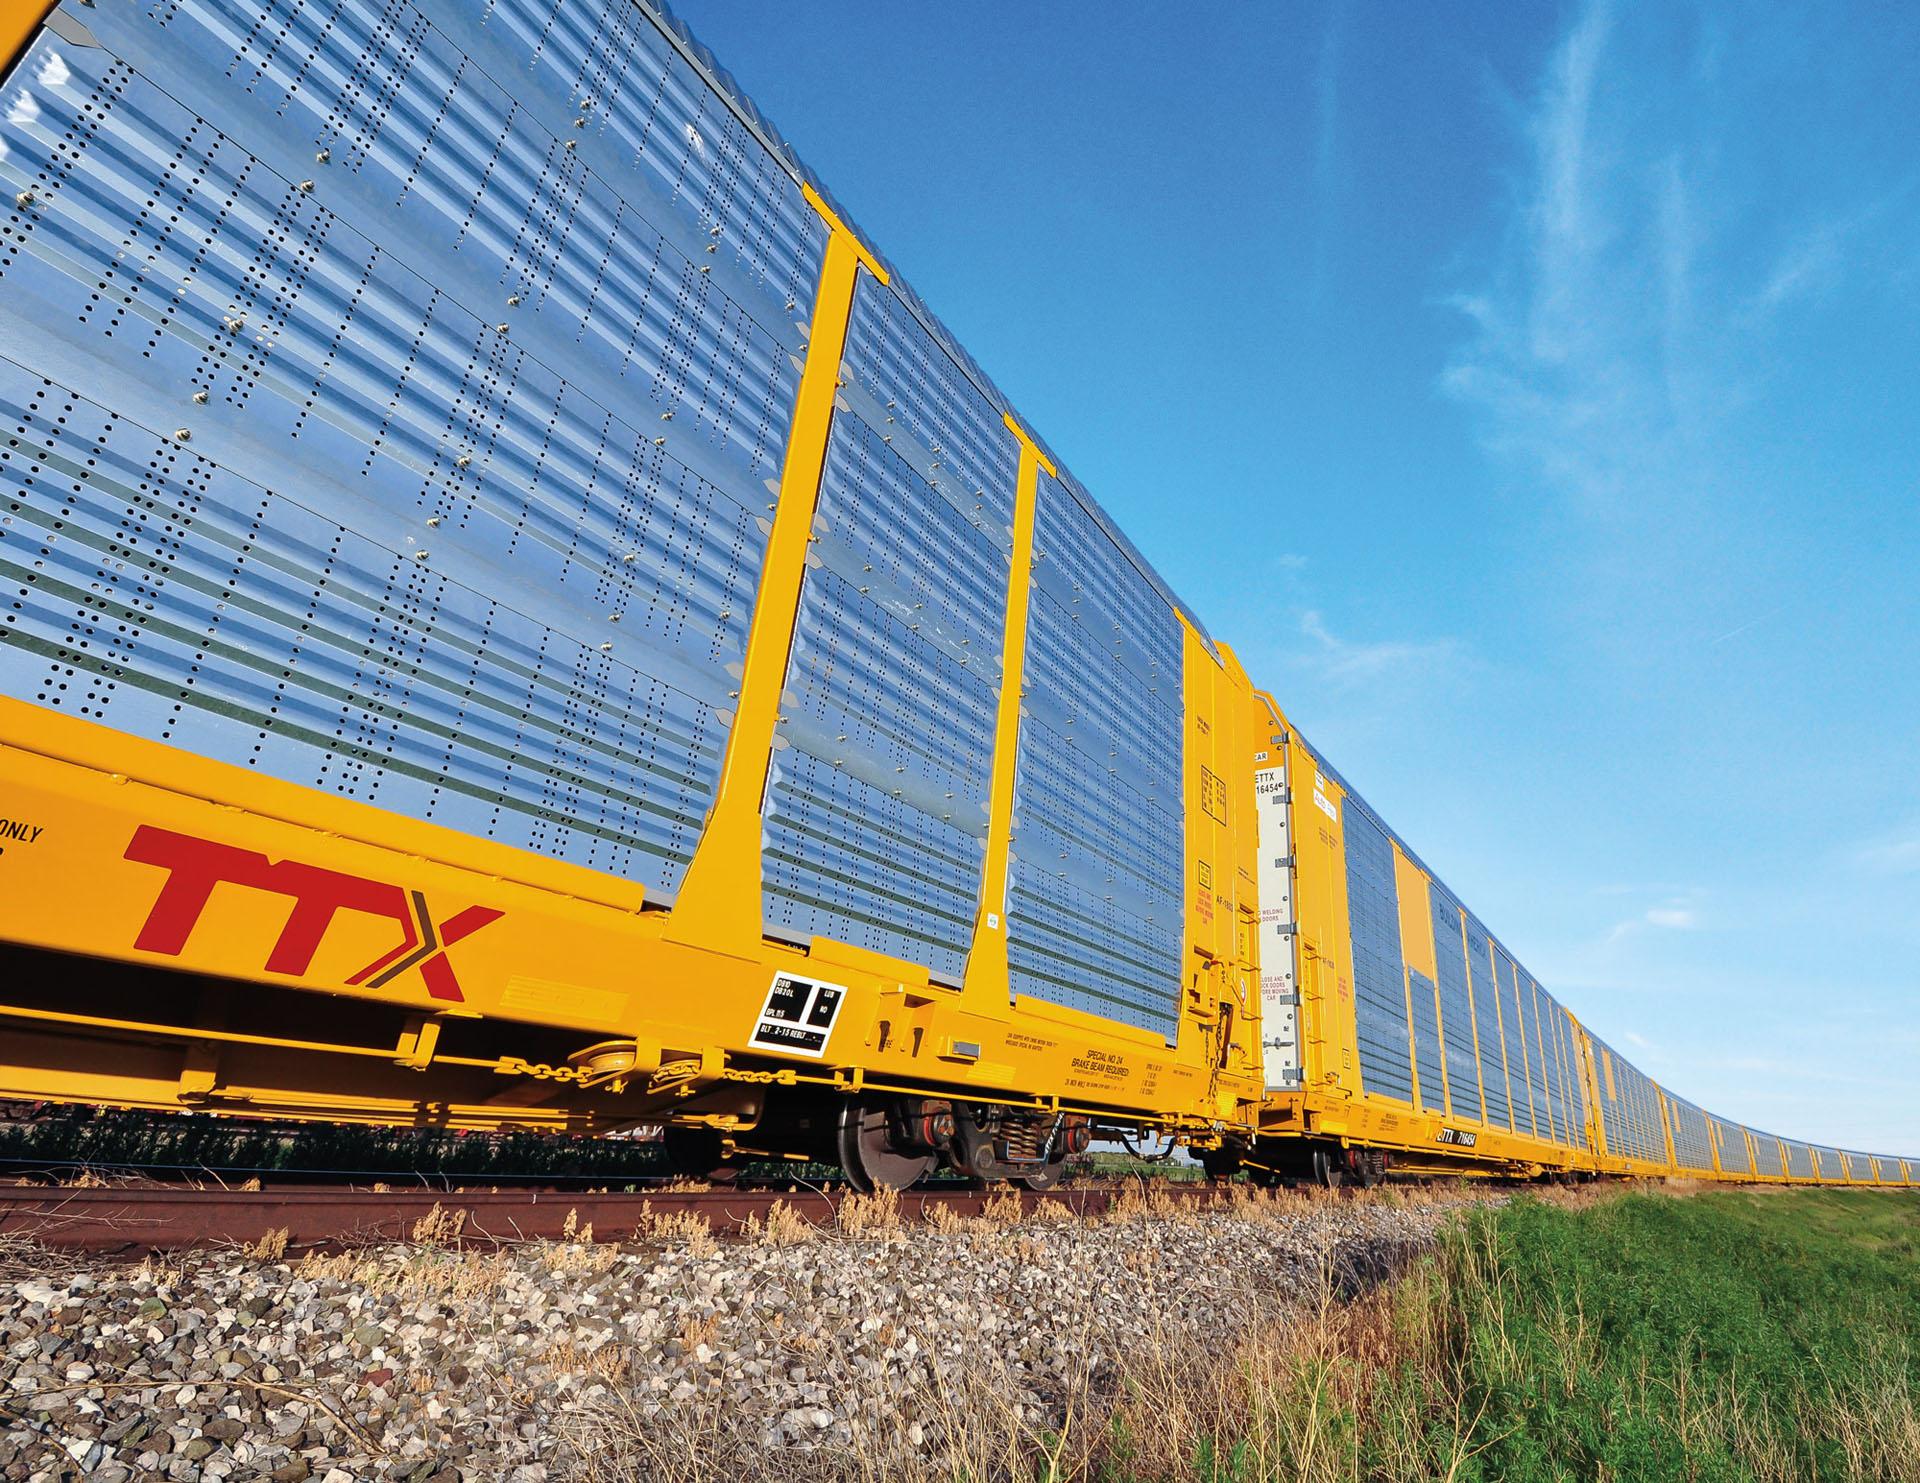 Transportation Company - TTX Company - Railroad Equipment